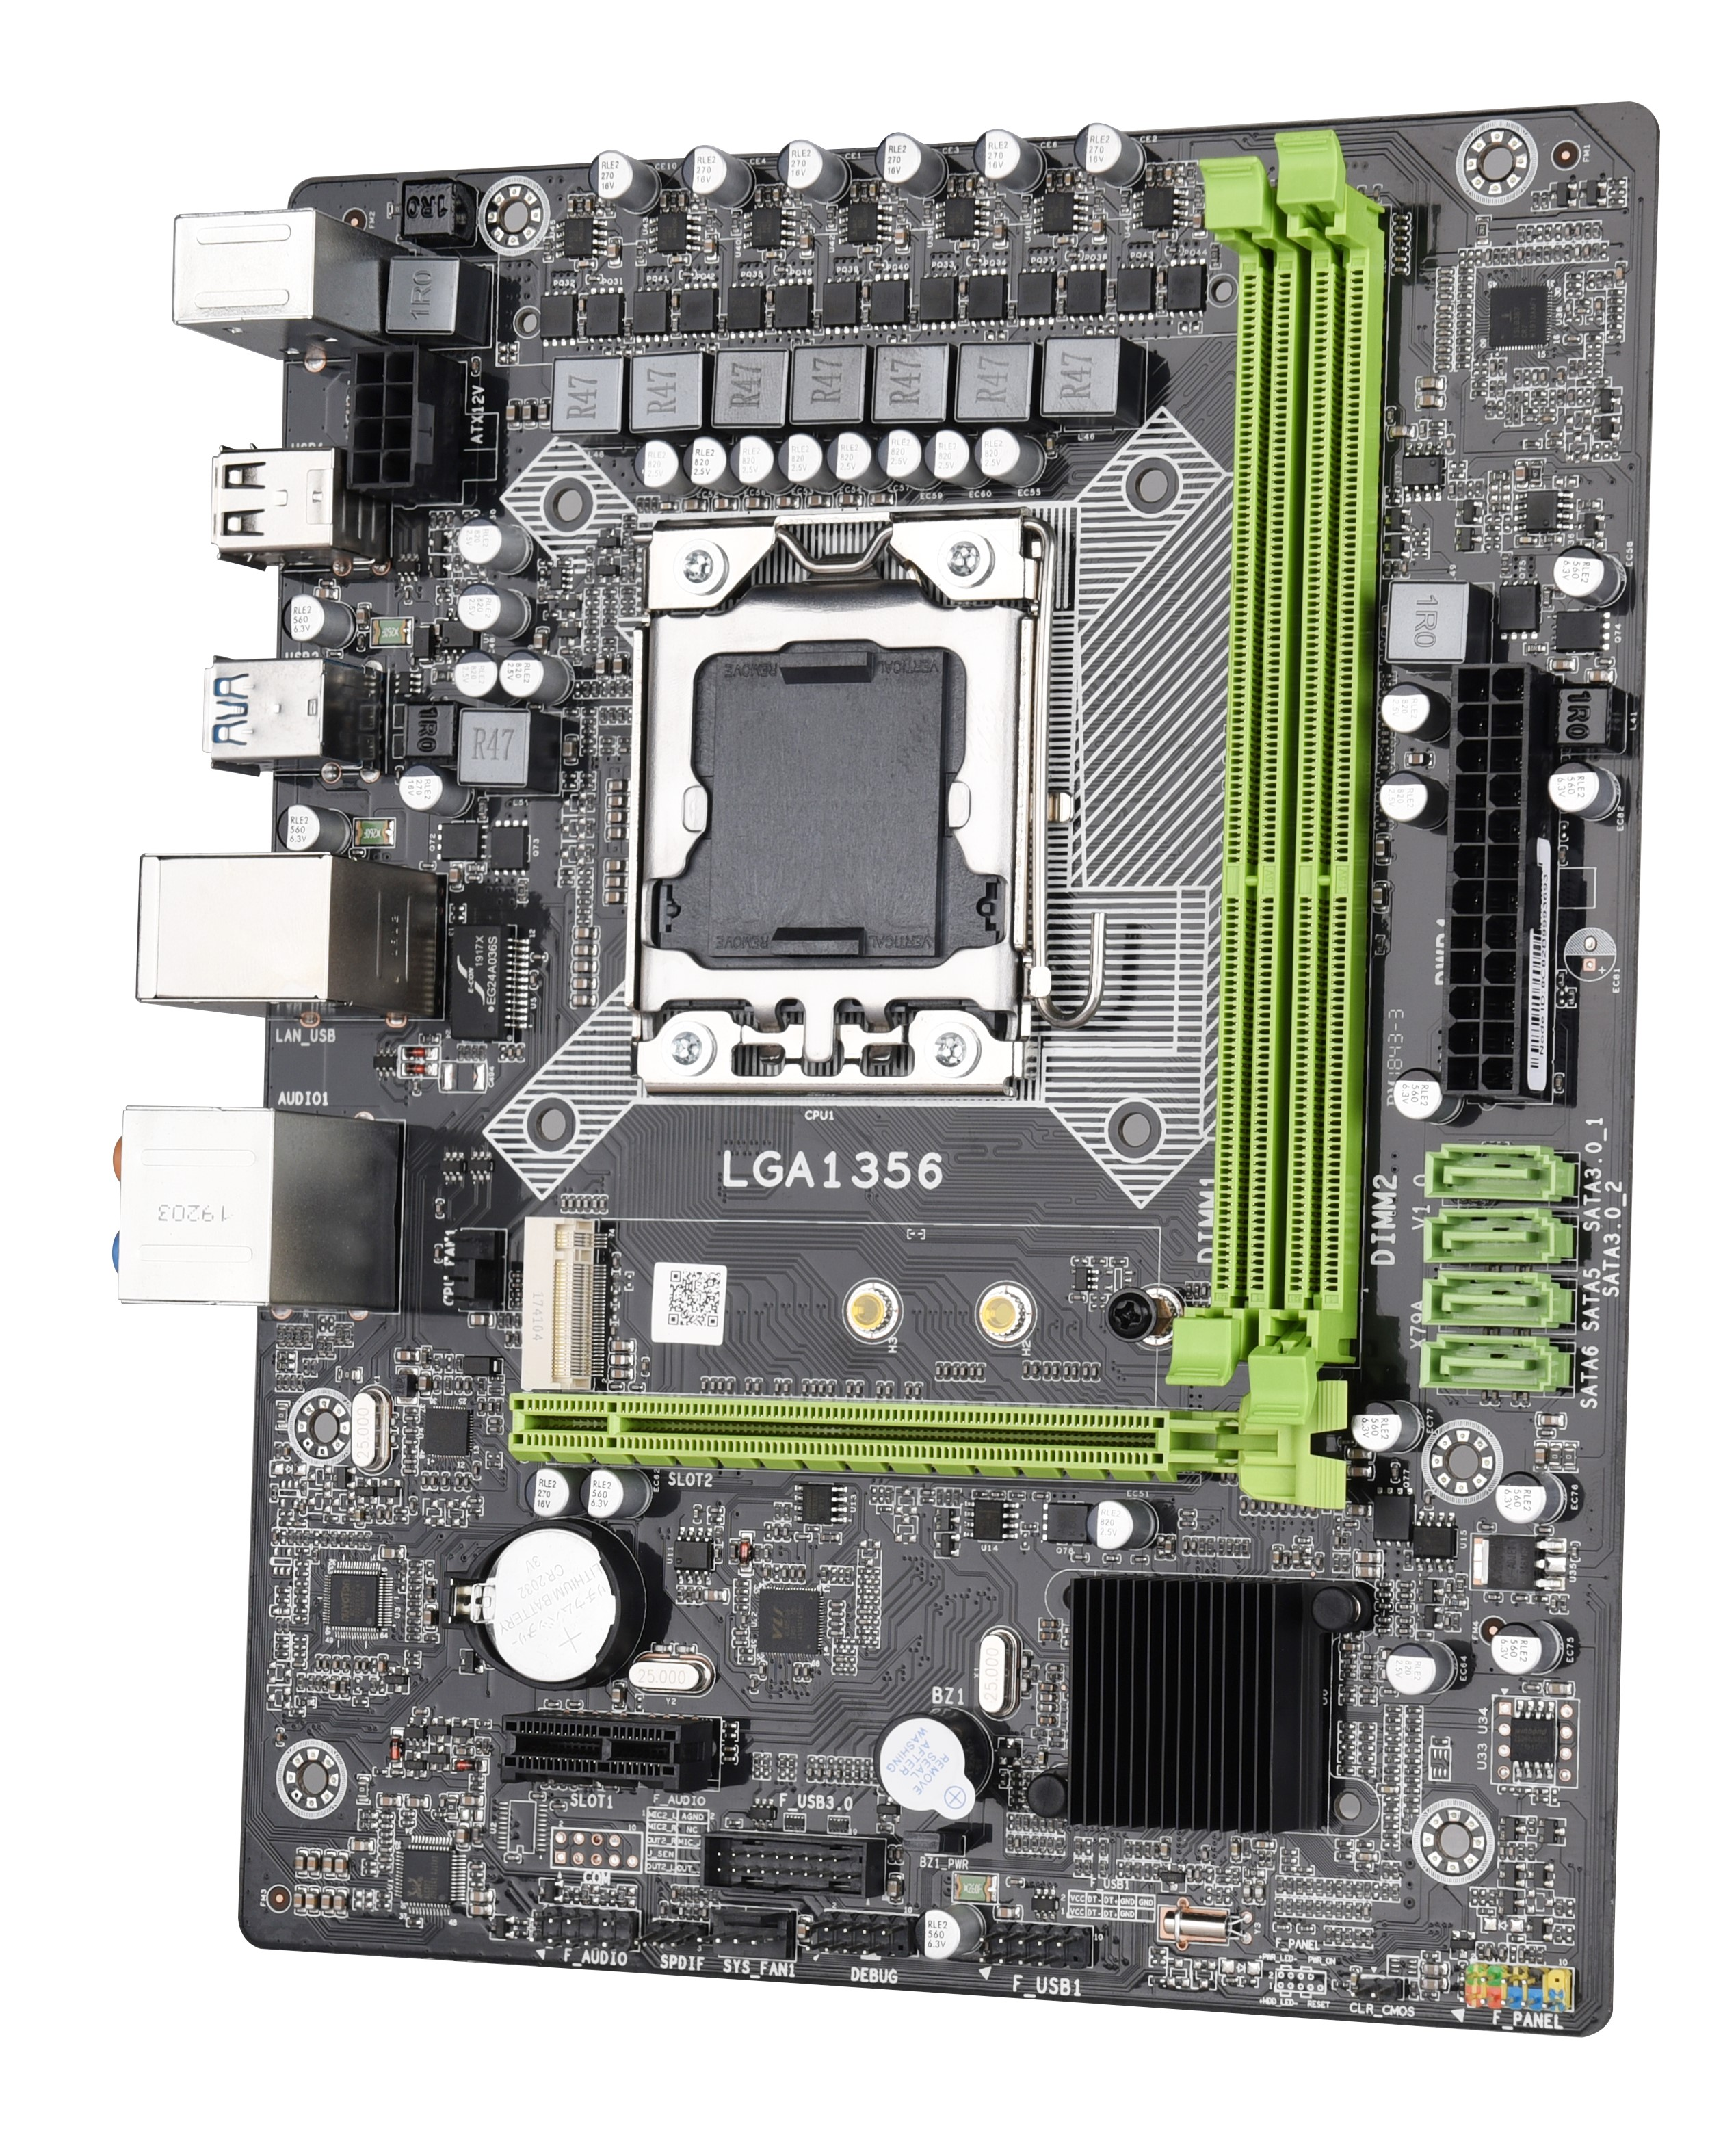 Image 2 - X79A Lga 1356 Motherboard Usb3.0 Support Reg Ecc Server Memory And Lga1356 Xeon E5 Processor For Desktop Server Ddr3 Ecc Reg R-in Motherboards from Computer & Office